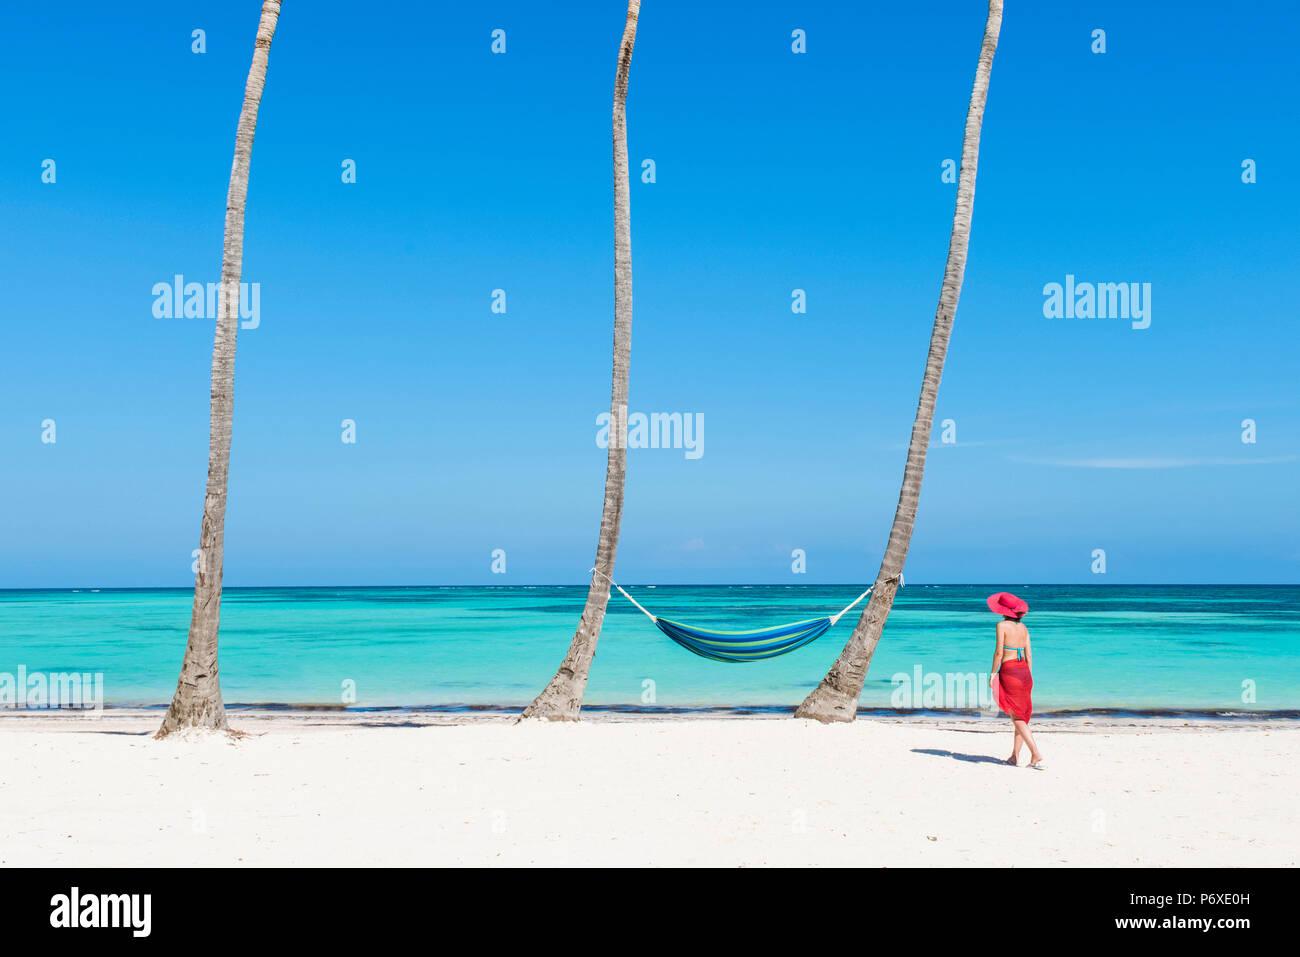 Juanillo Beach (playa Juanillo), Punta Cana, Dominican Republic. Woman walking on a palm-fringed beach (MR). Stock Photo